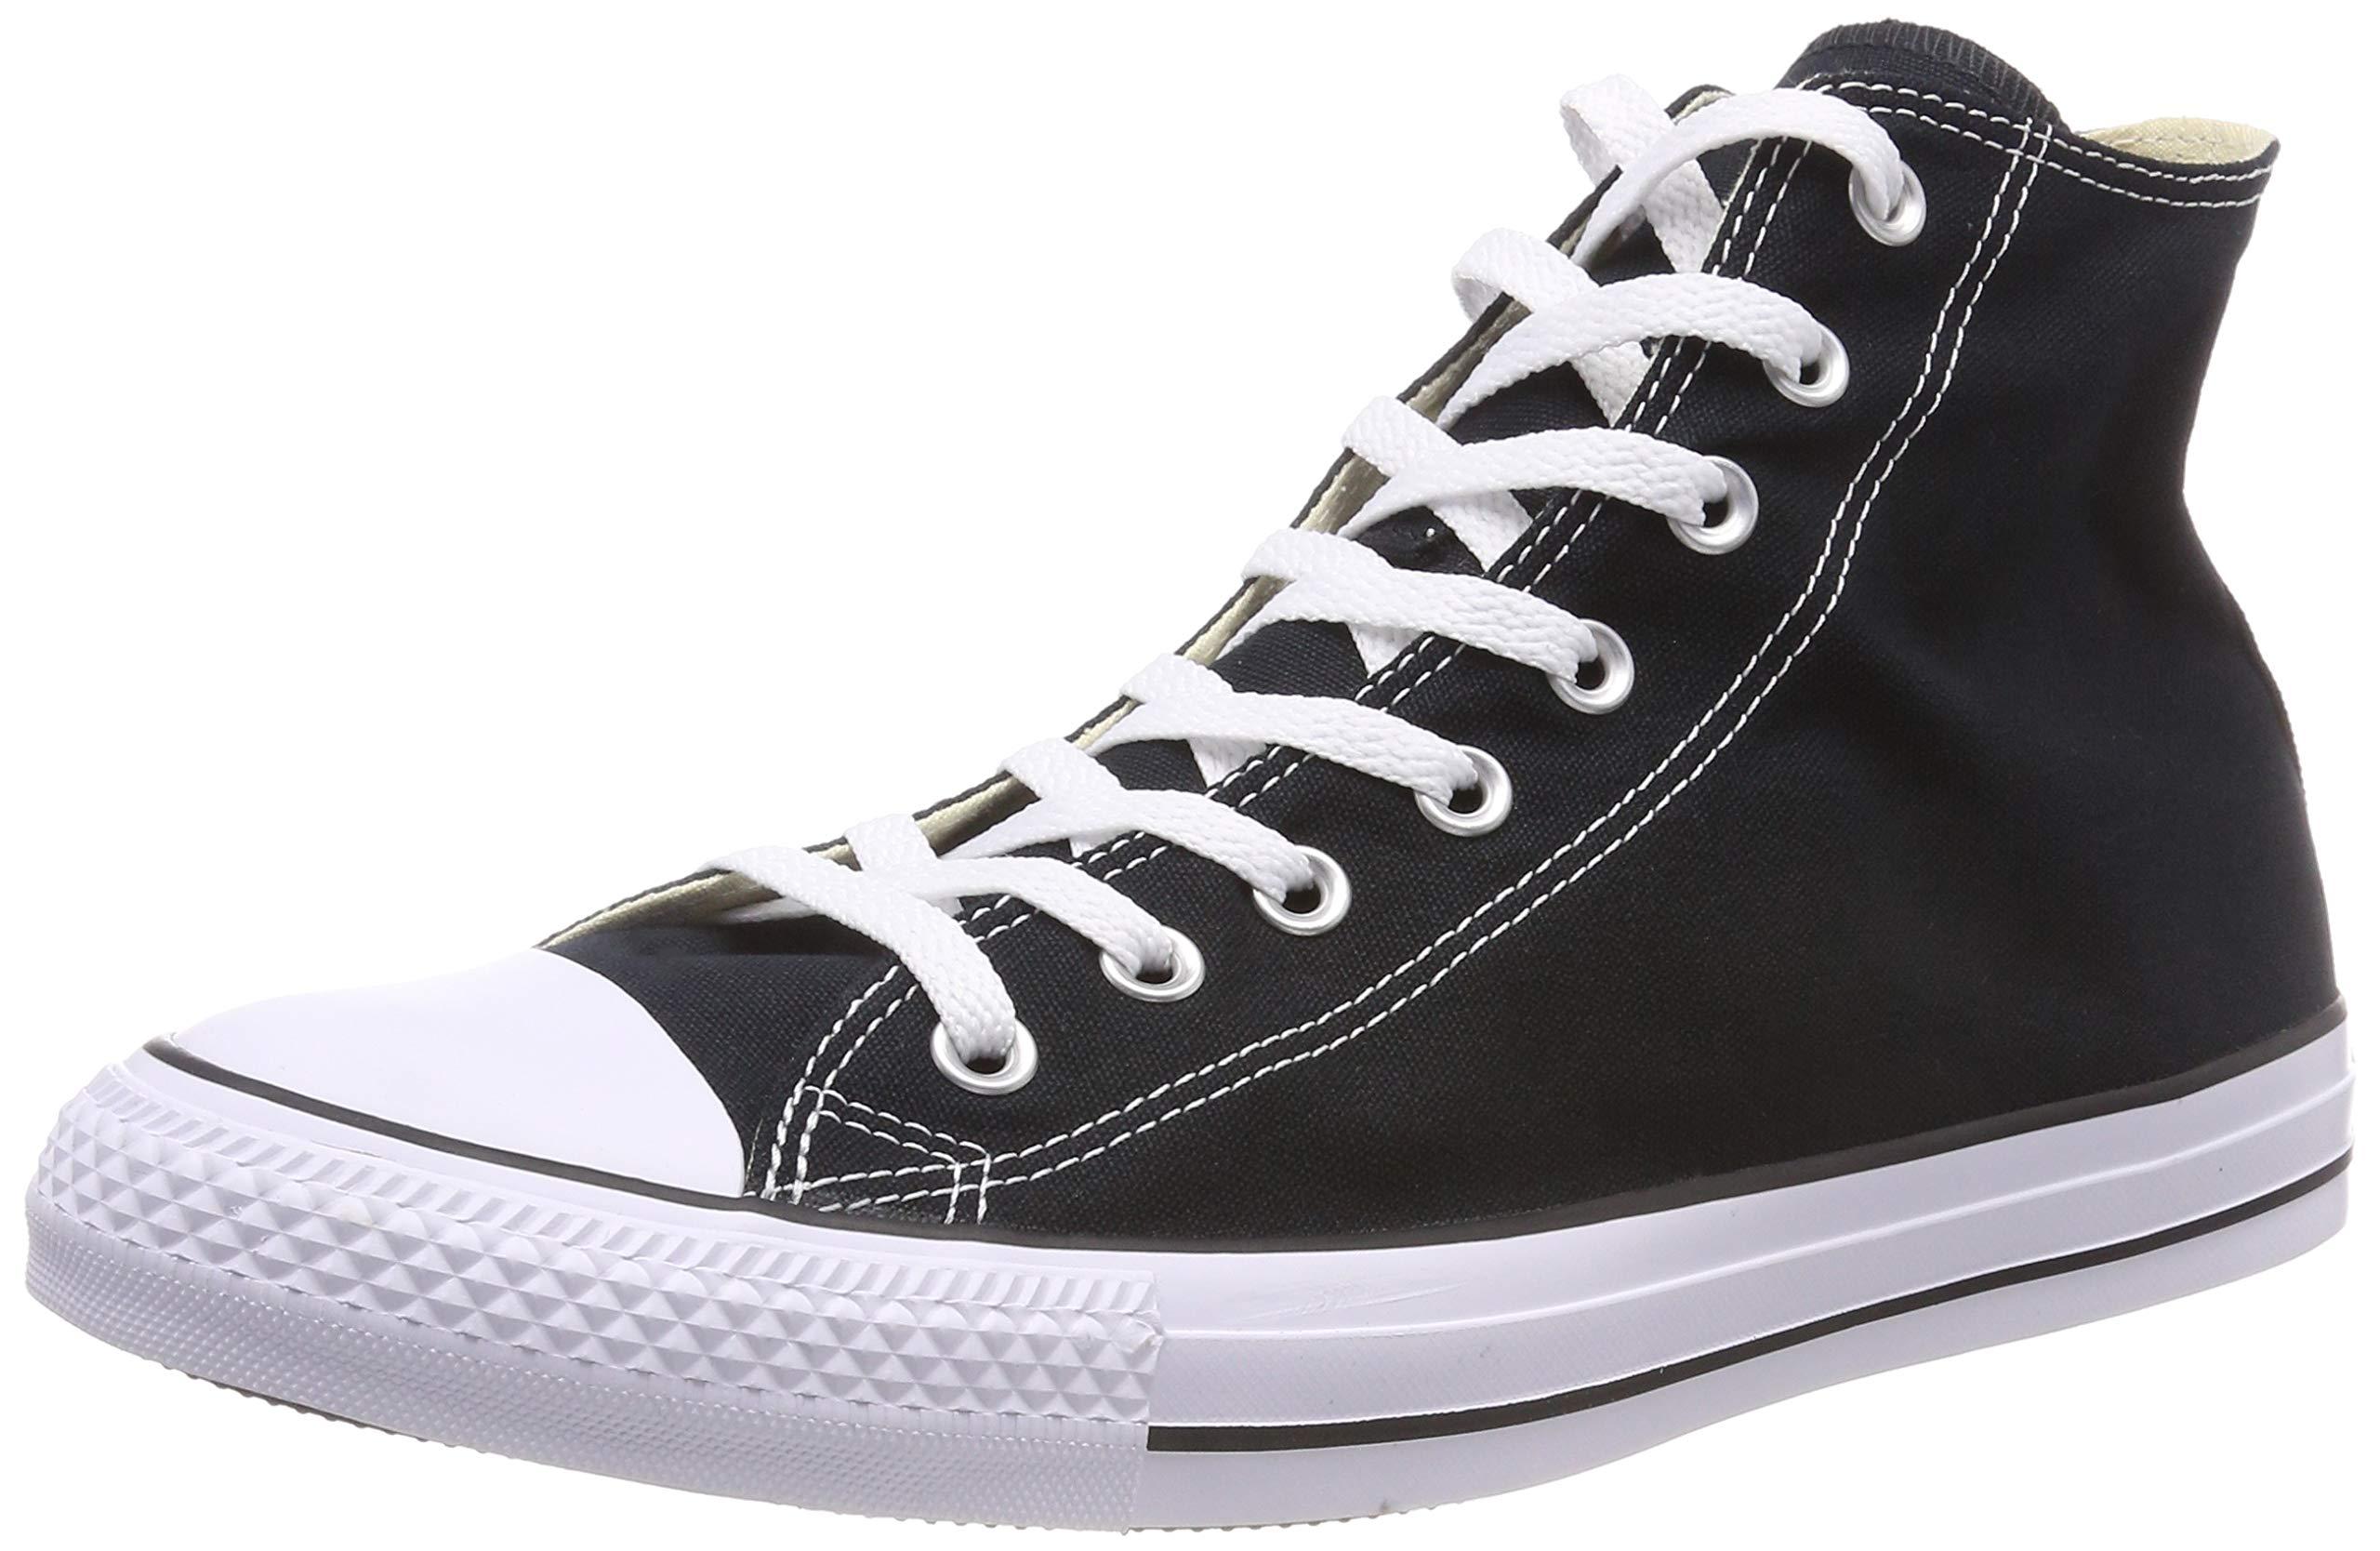 Converse Chuck Taylor All Star Canvas High Top Sneaker, Black, 9 US Men/11 US Women